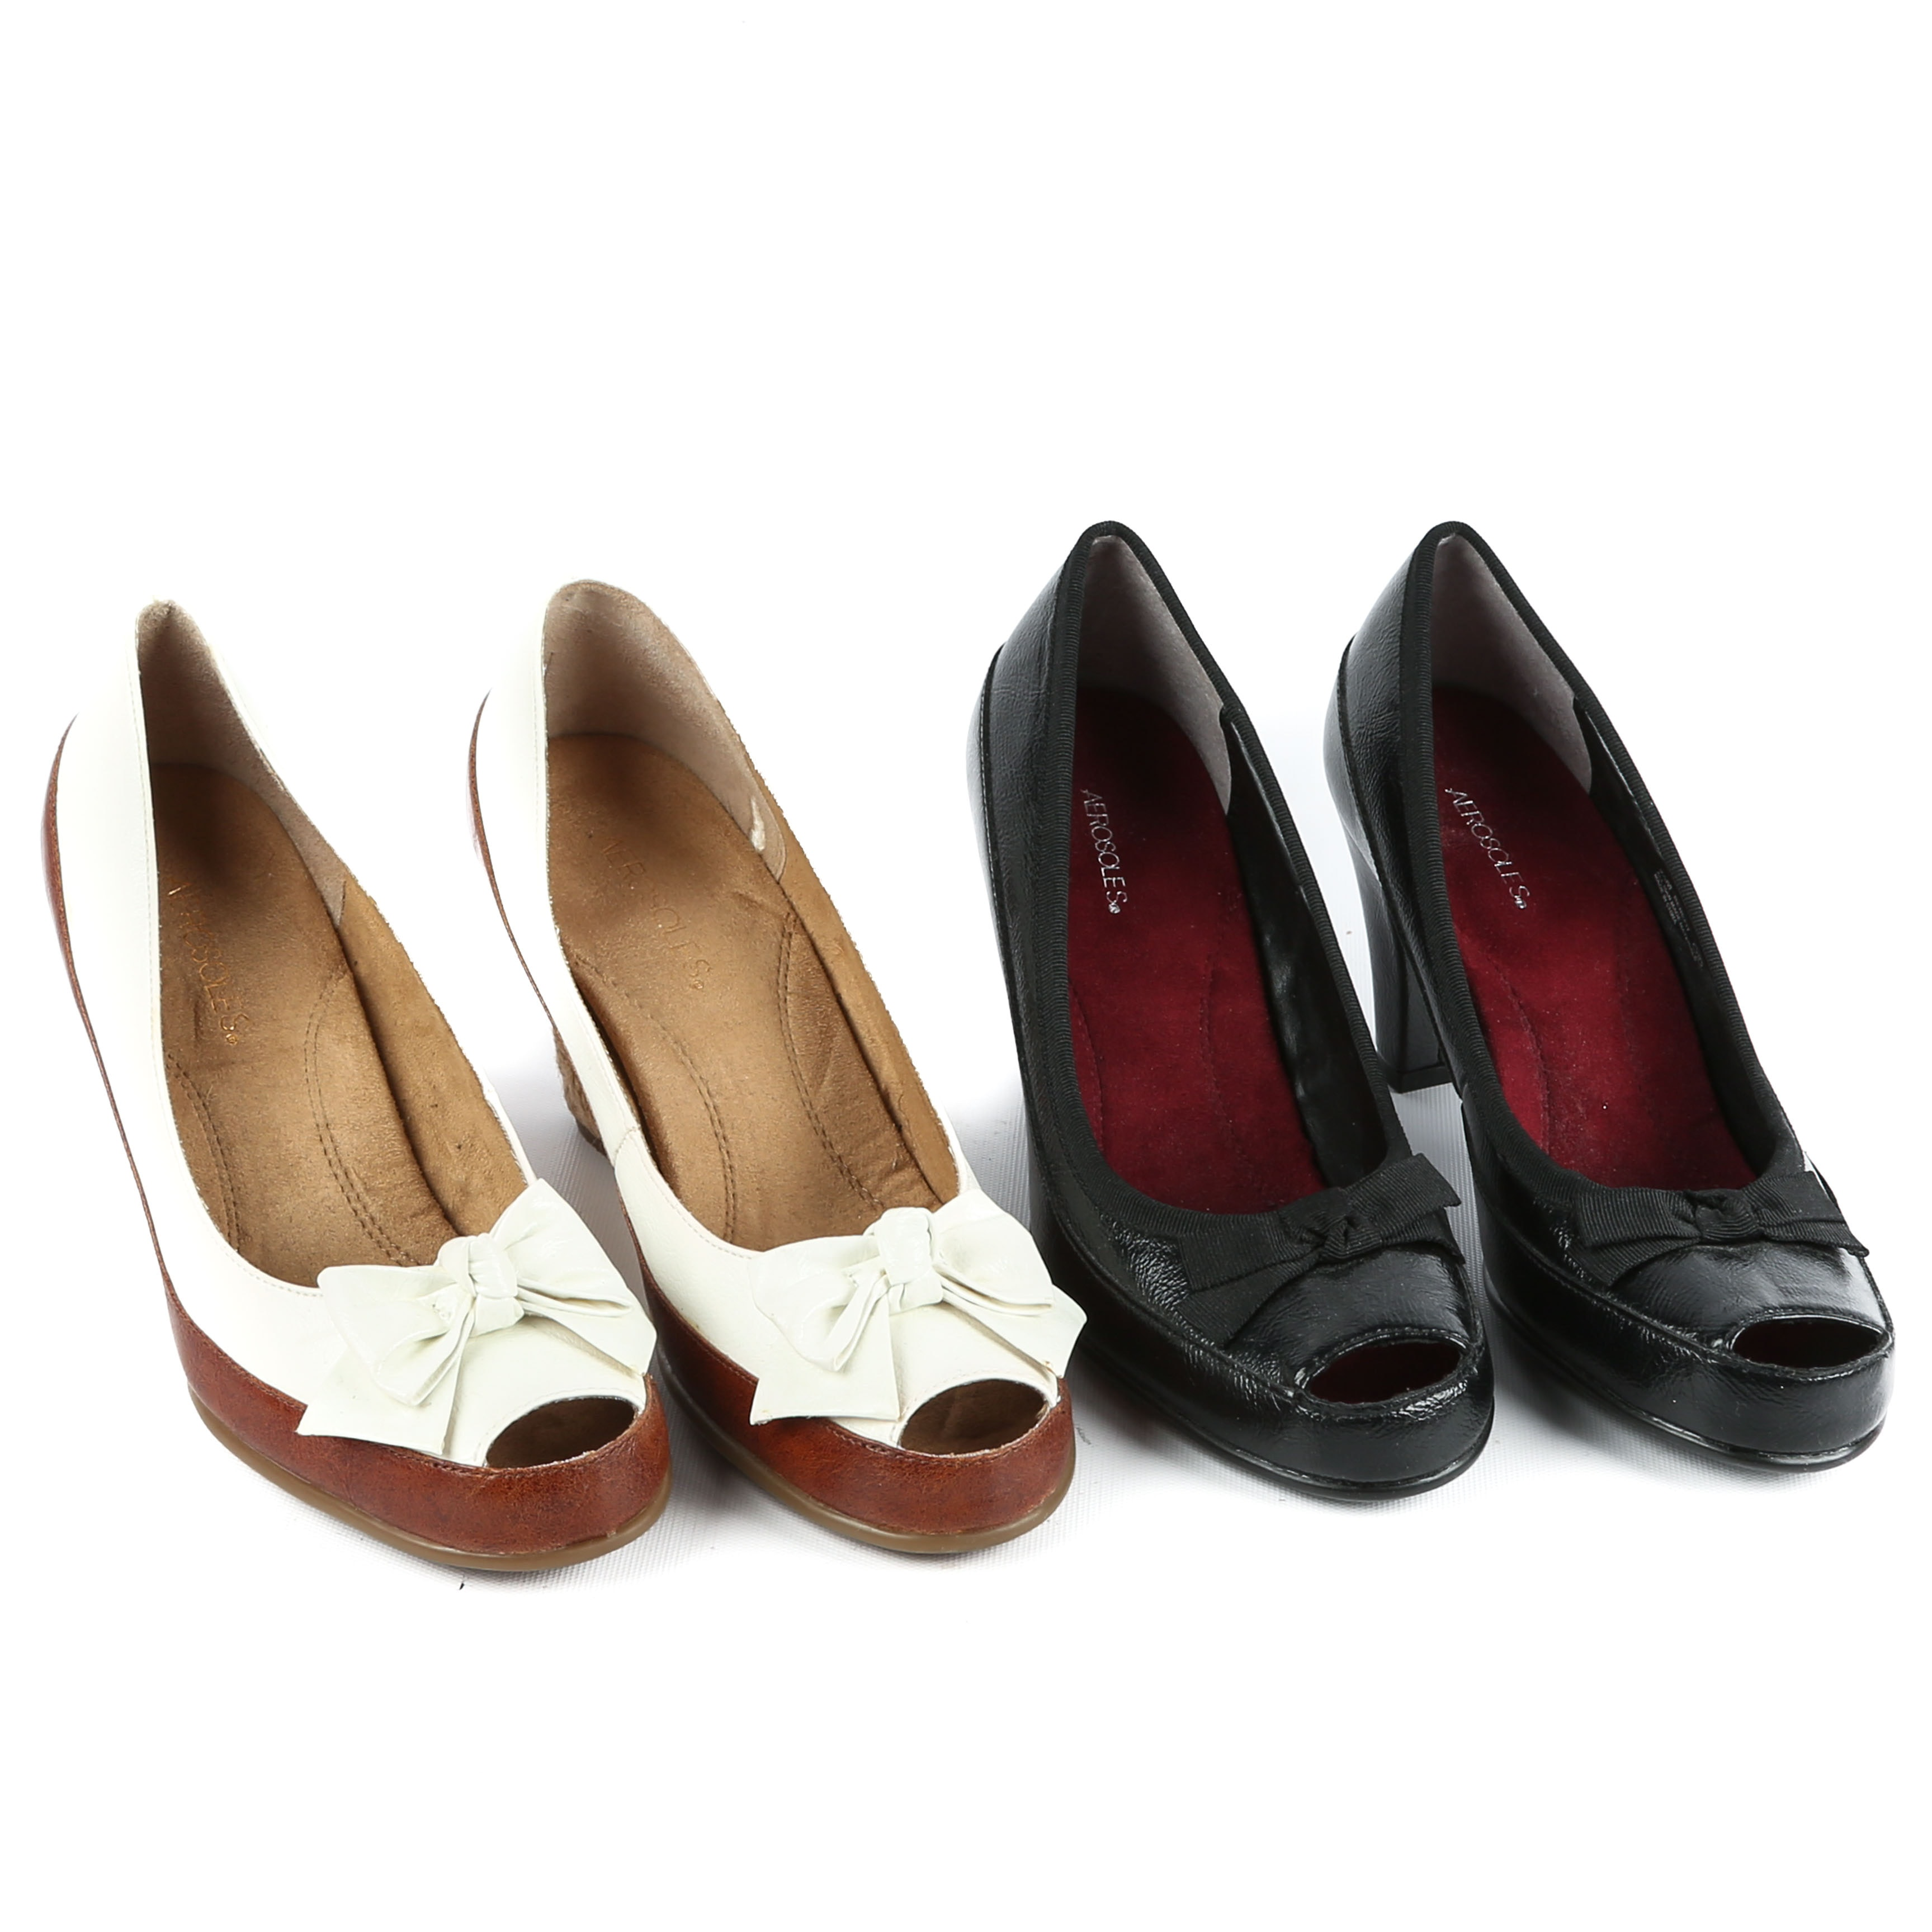 Women's Shoes Featuring Aerosoles